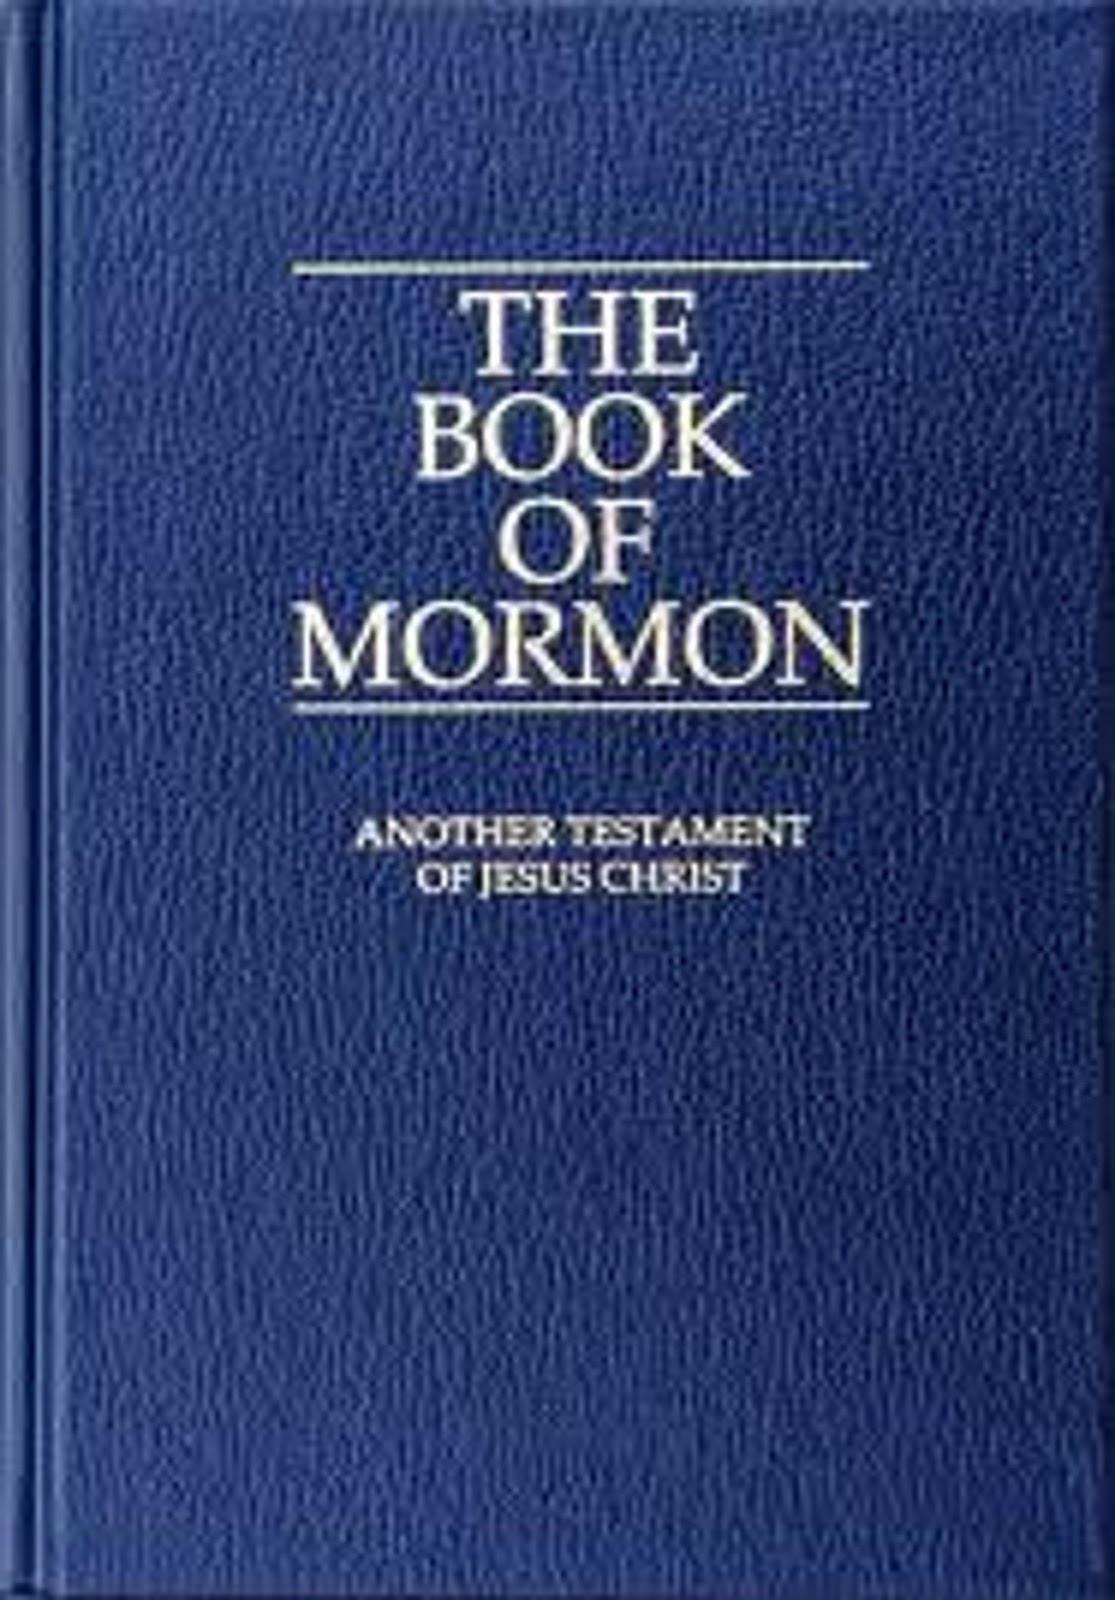 BOOK OF MORMON, D and C, JESUS THE CHRIST, ARTICLES OF FAITH- Temple Emblem 4 Books